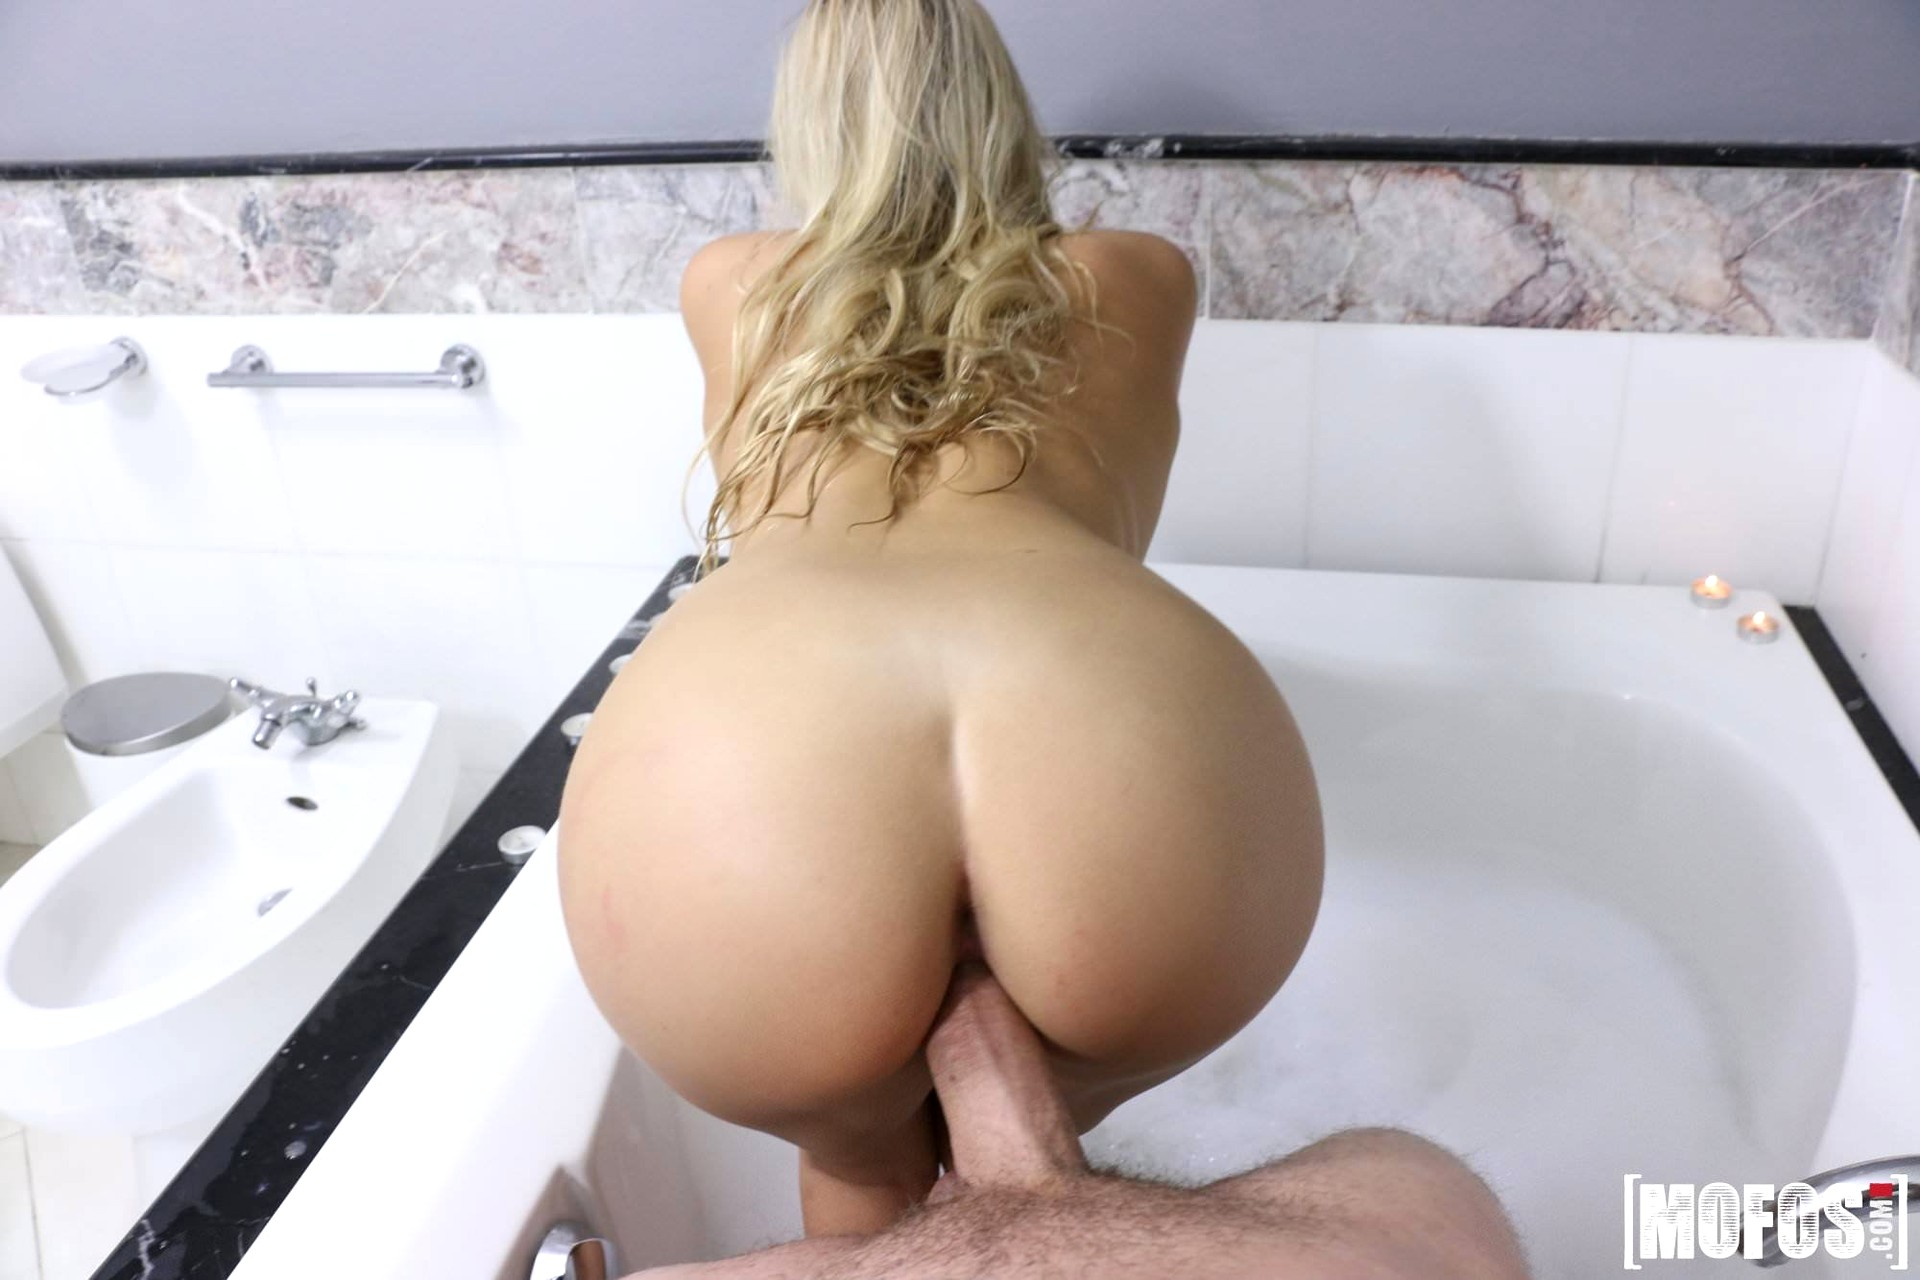 fwmale porn stars nude